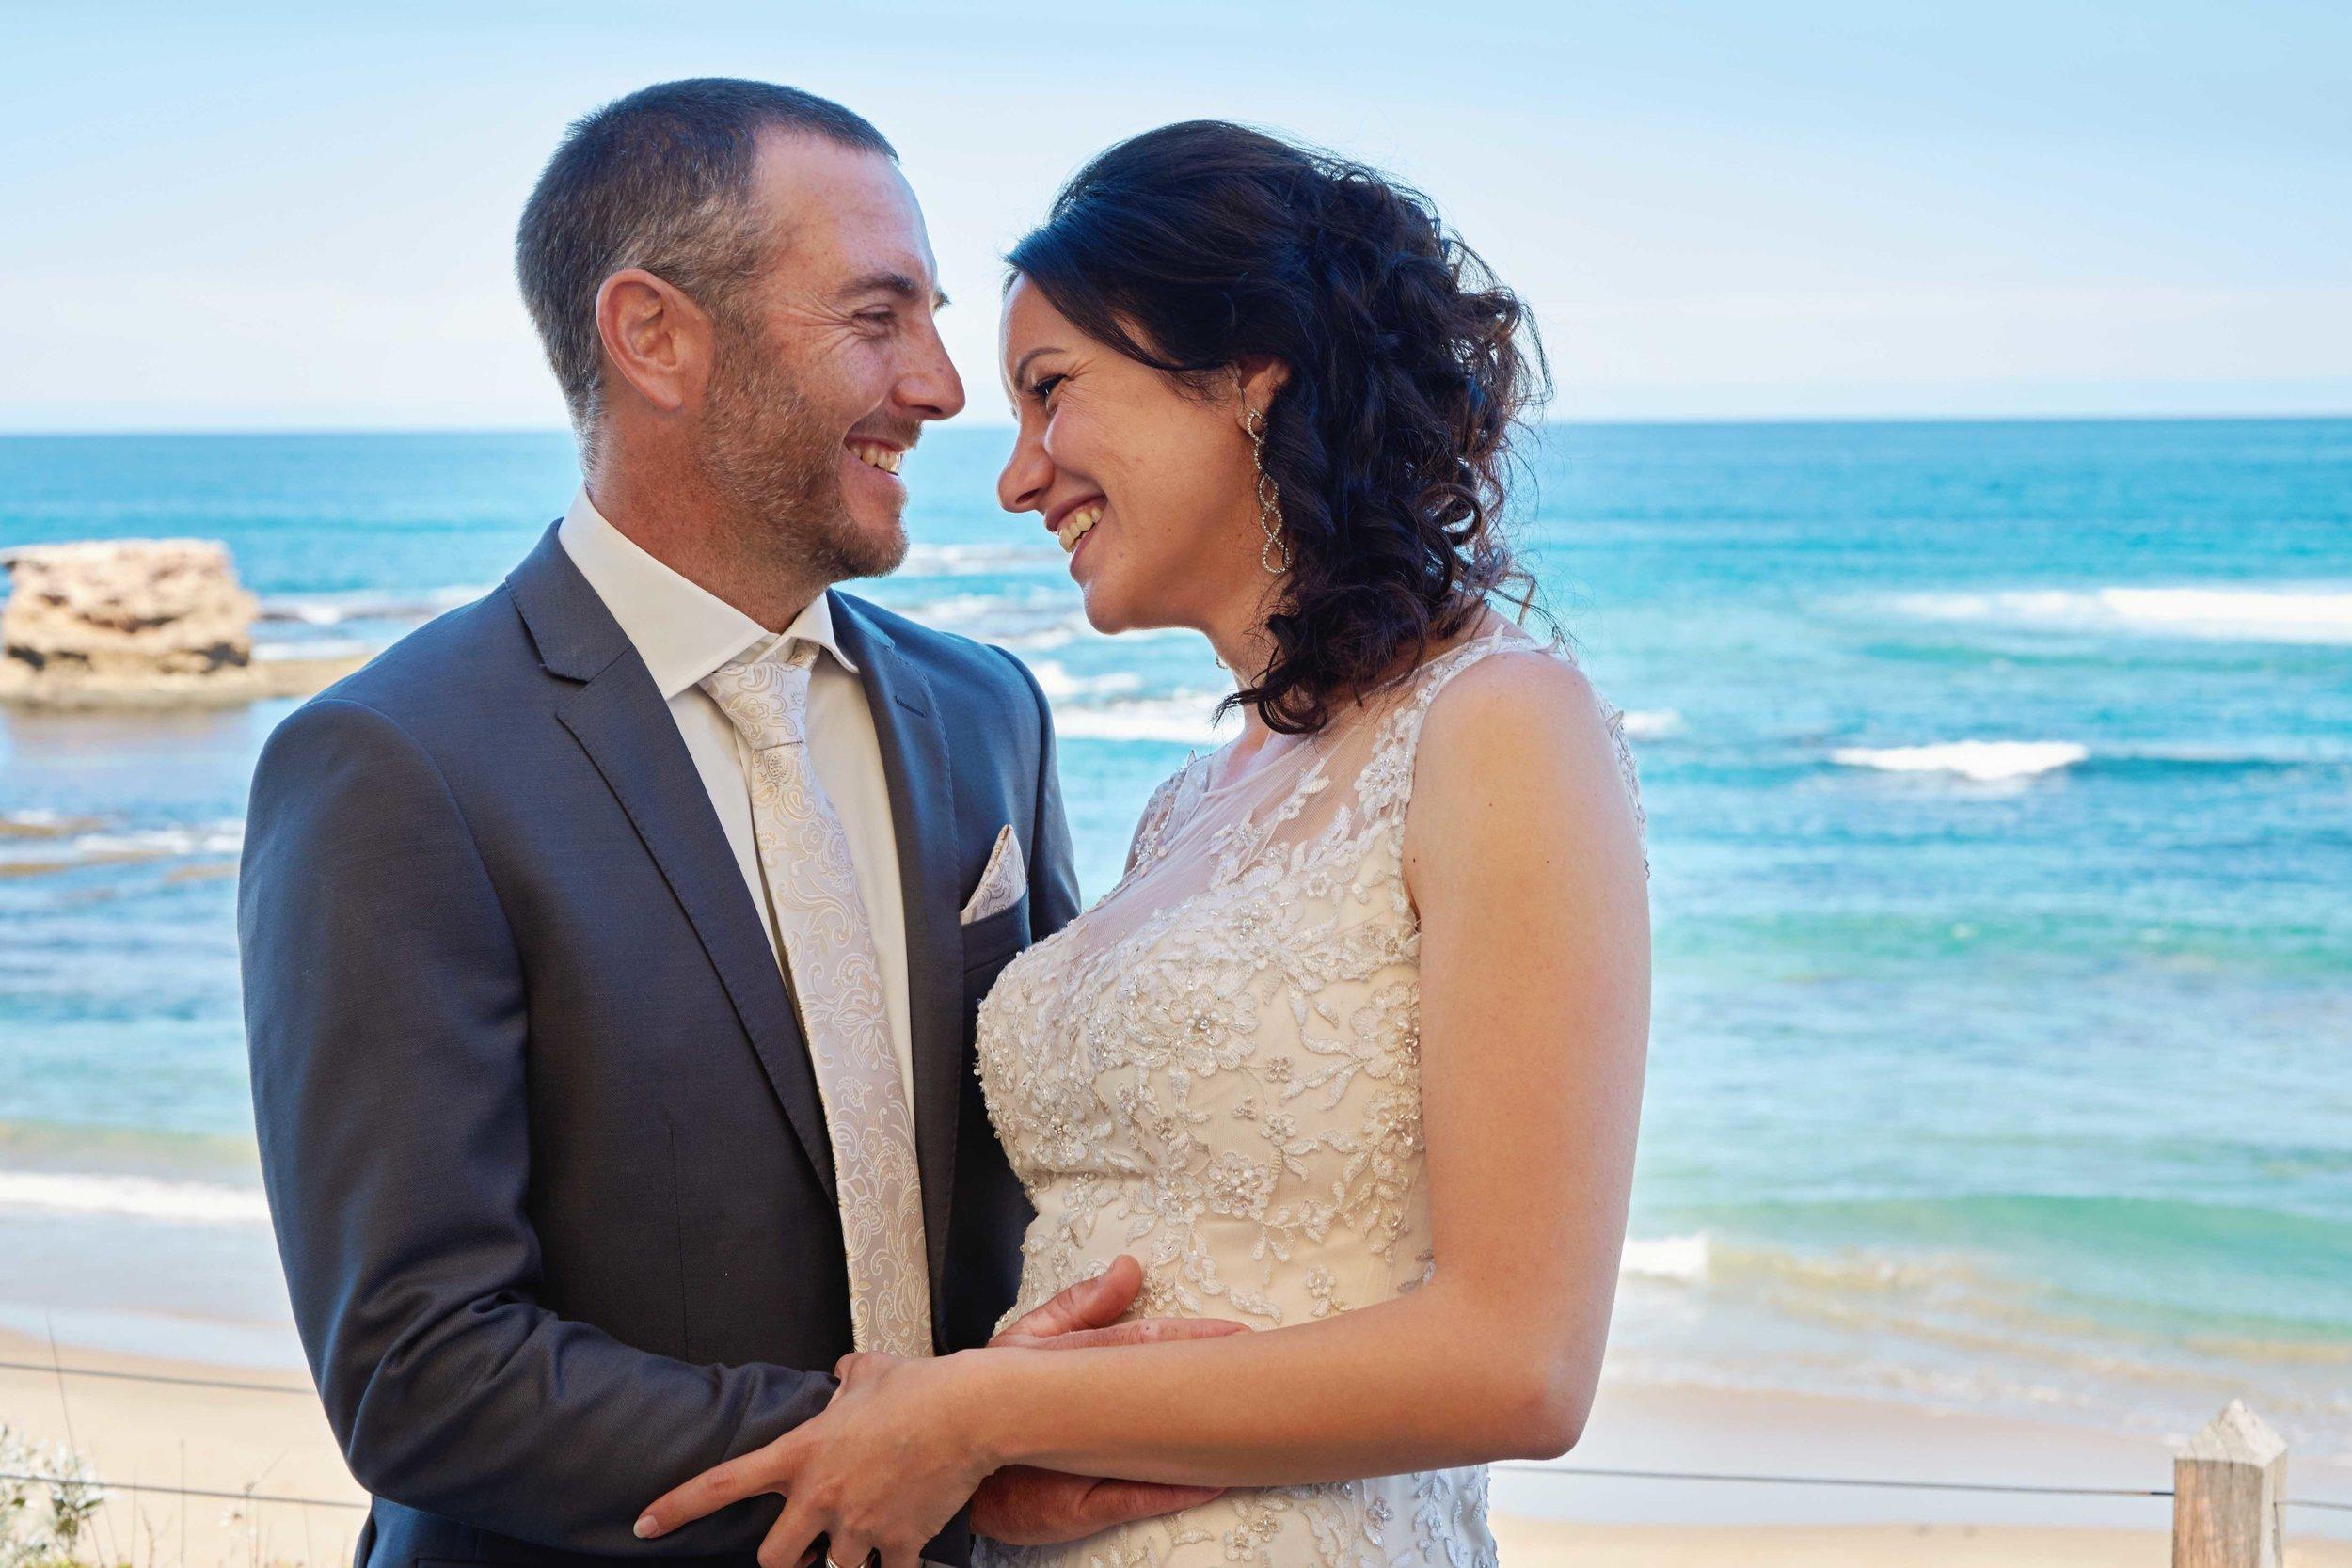 sorrento-wedding-photography-all-smiles-marissa-jade-photography-70.jpg